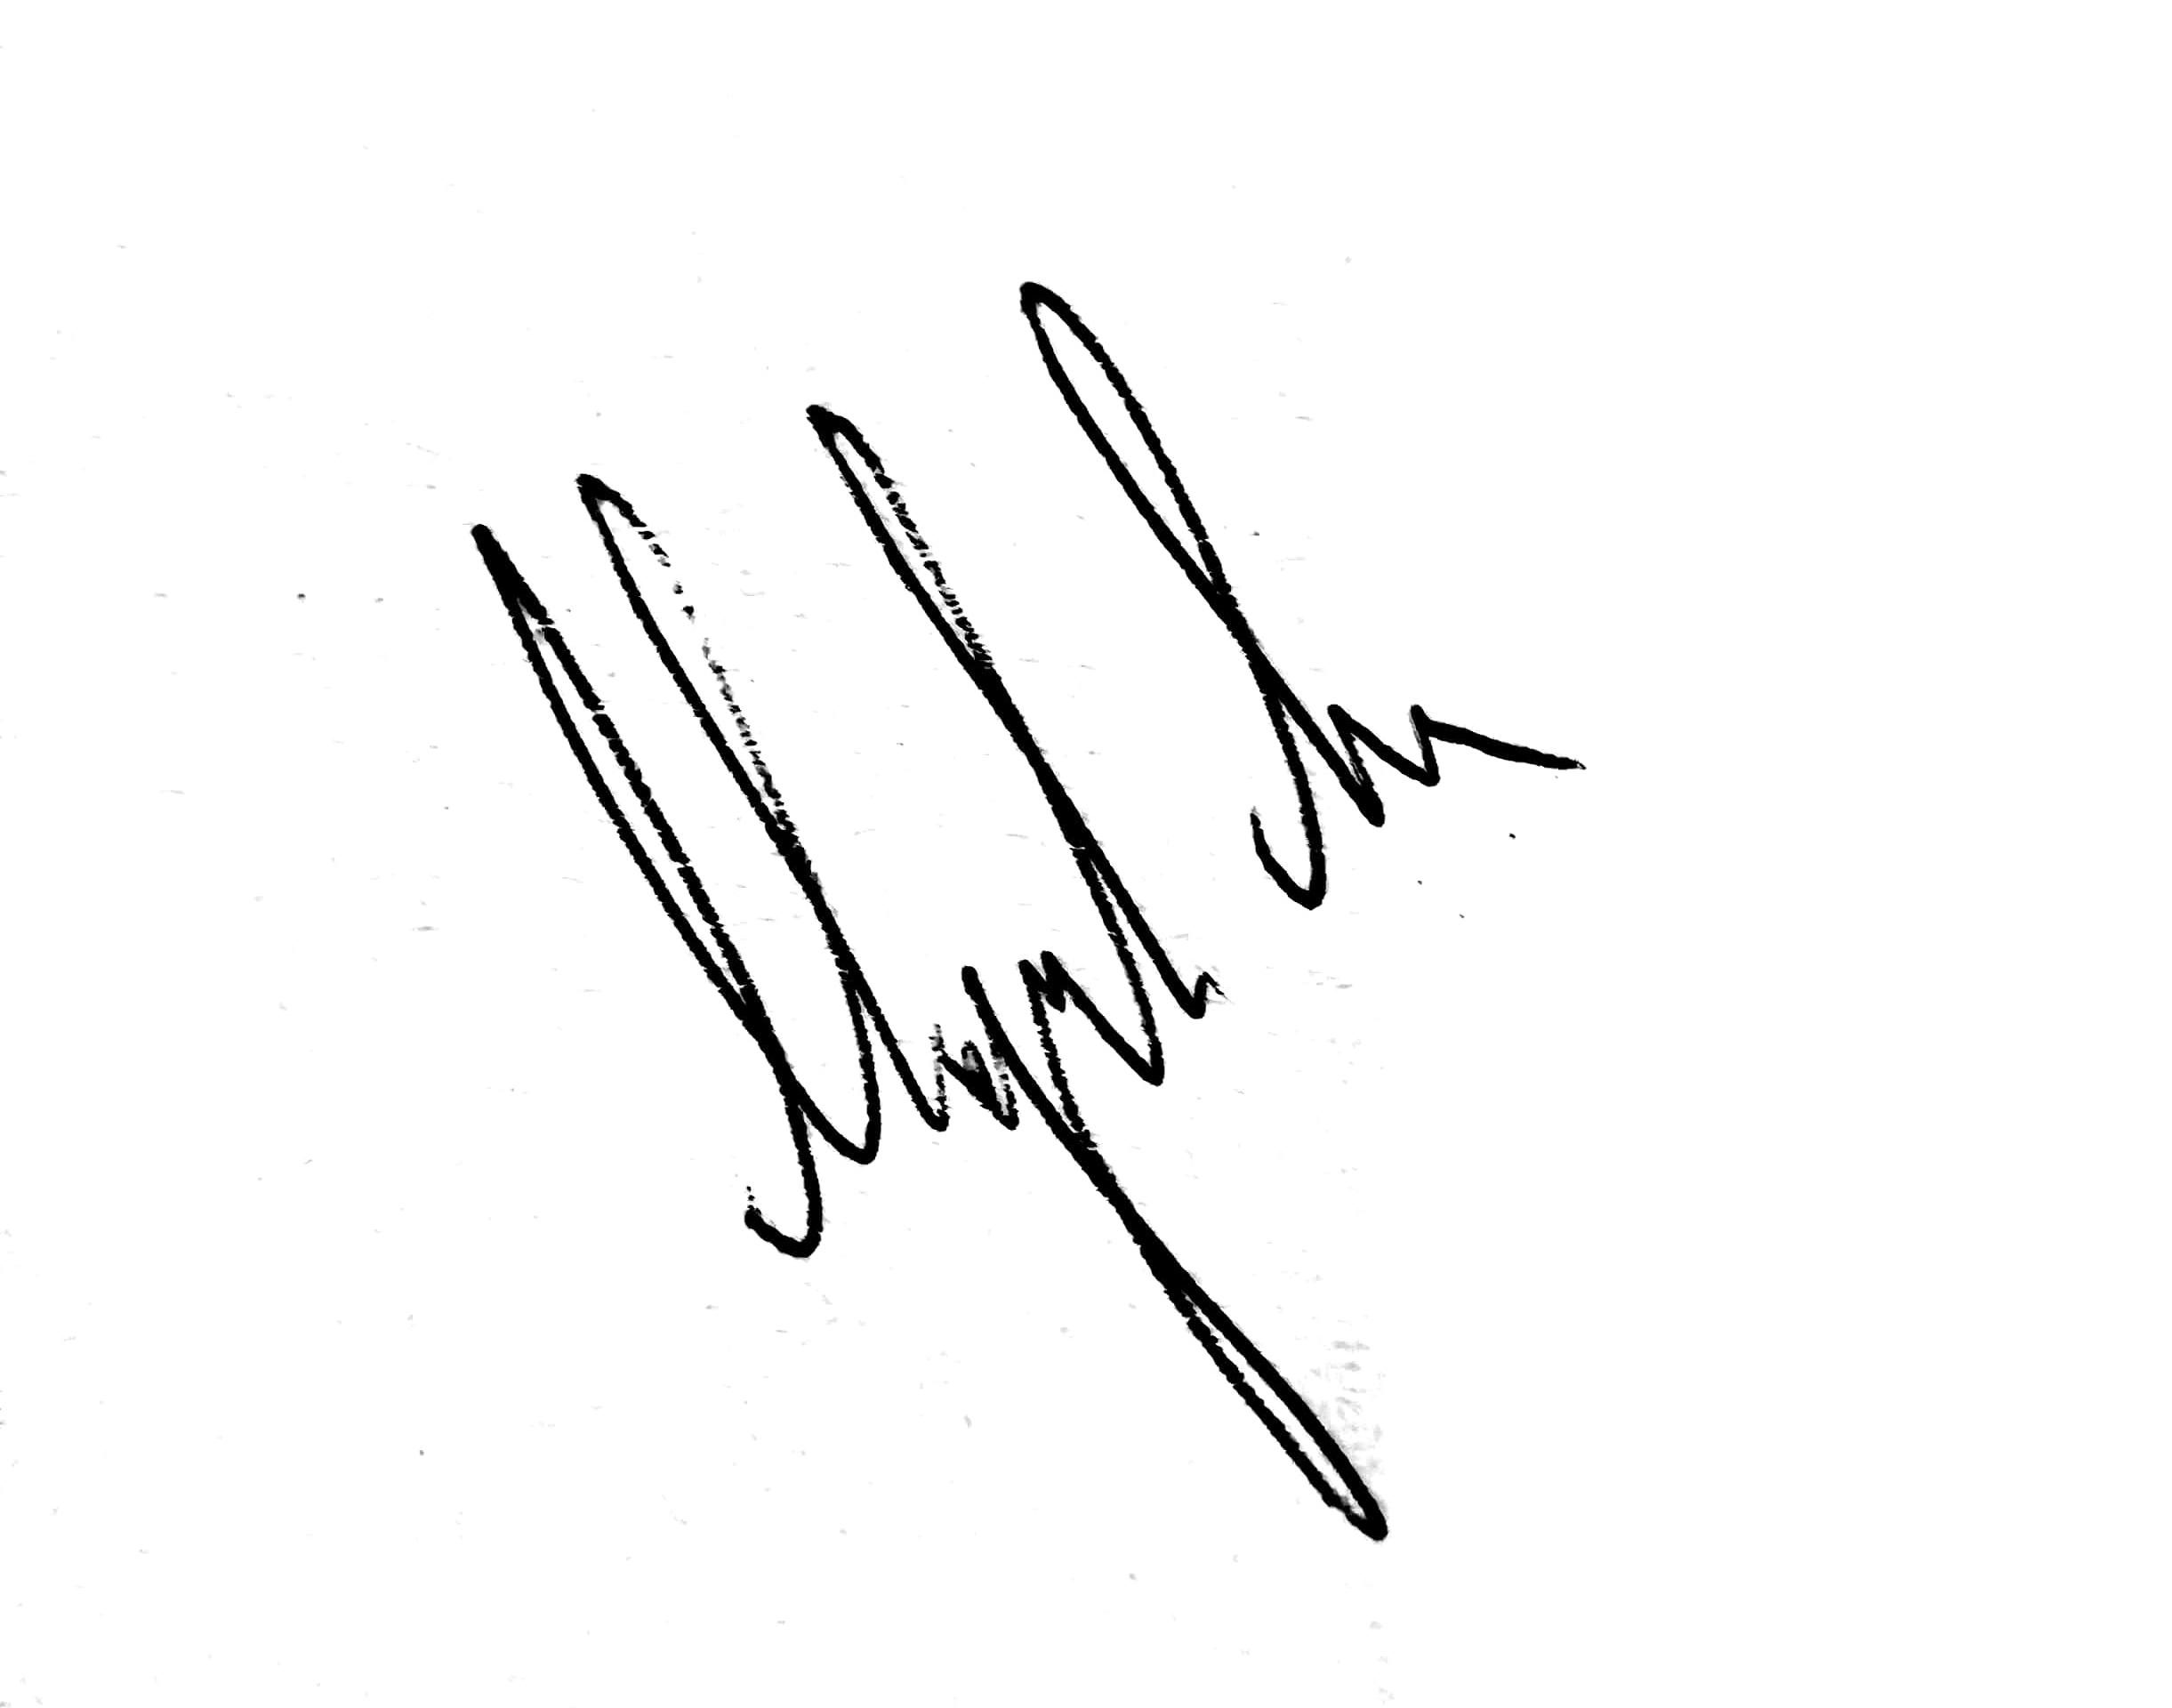 mayank-signature